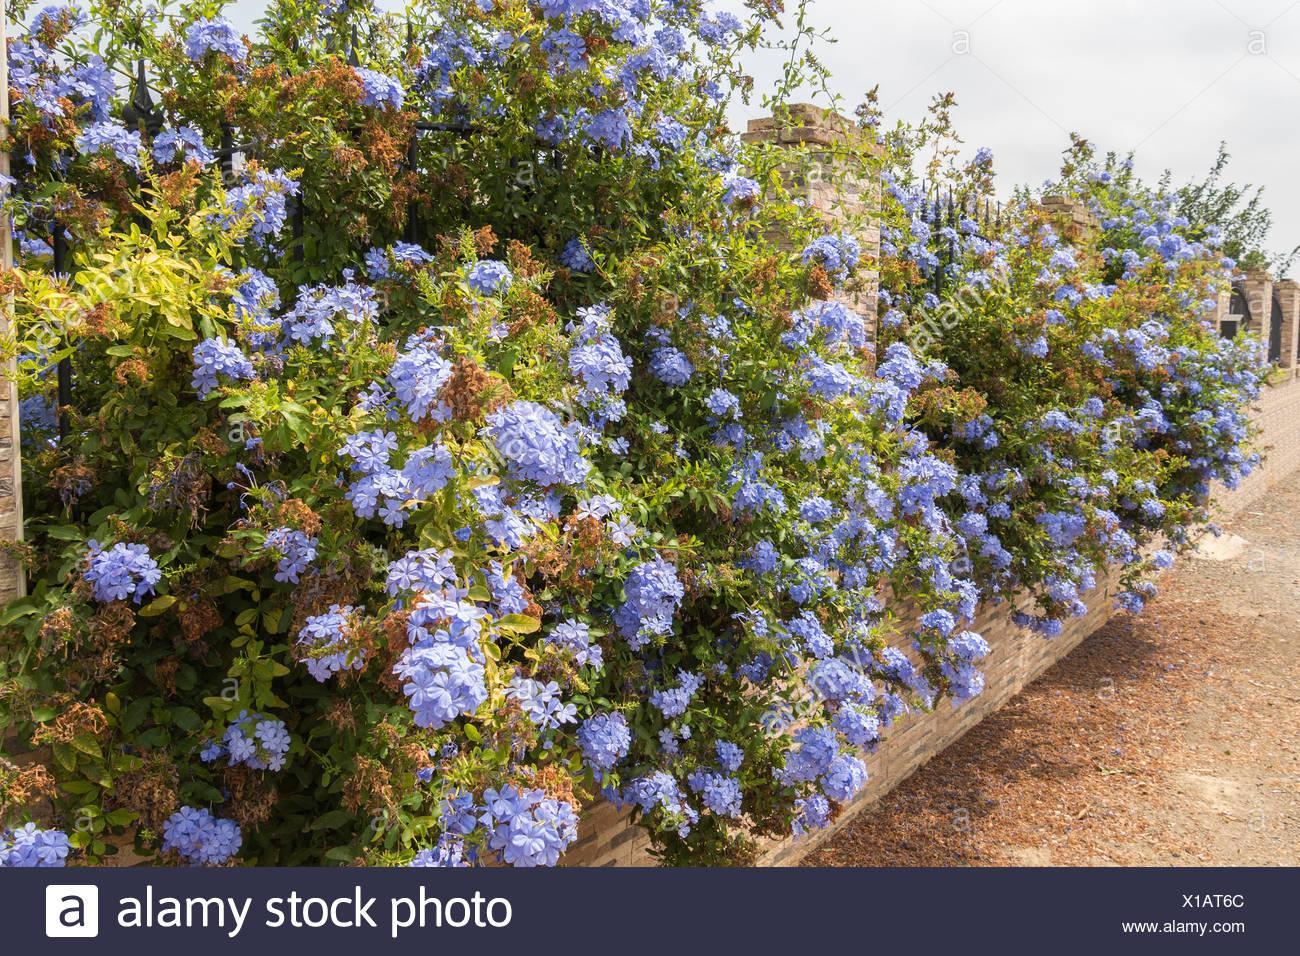 Blue flowers plumbago auriculata cape leadwort blue jasmine stock blue flowers plumbago auriculata cape leadwort blue jasmine izmirmasajfo